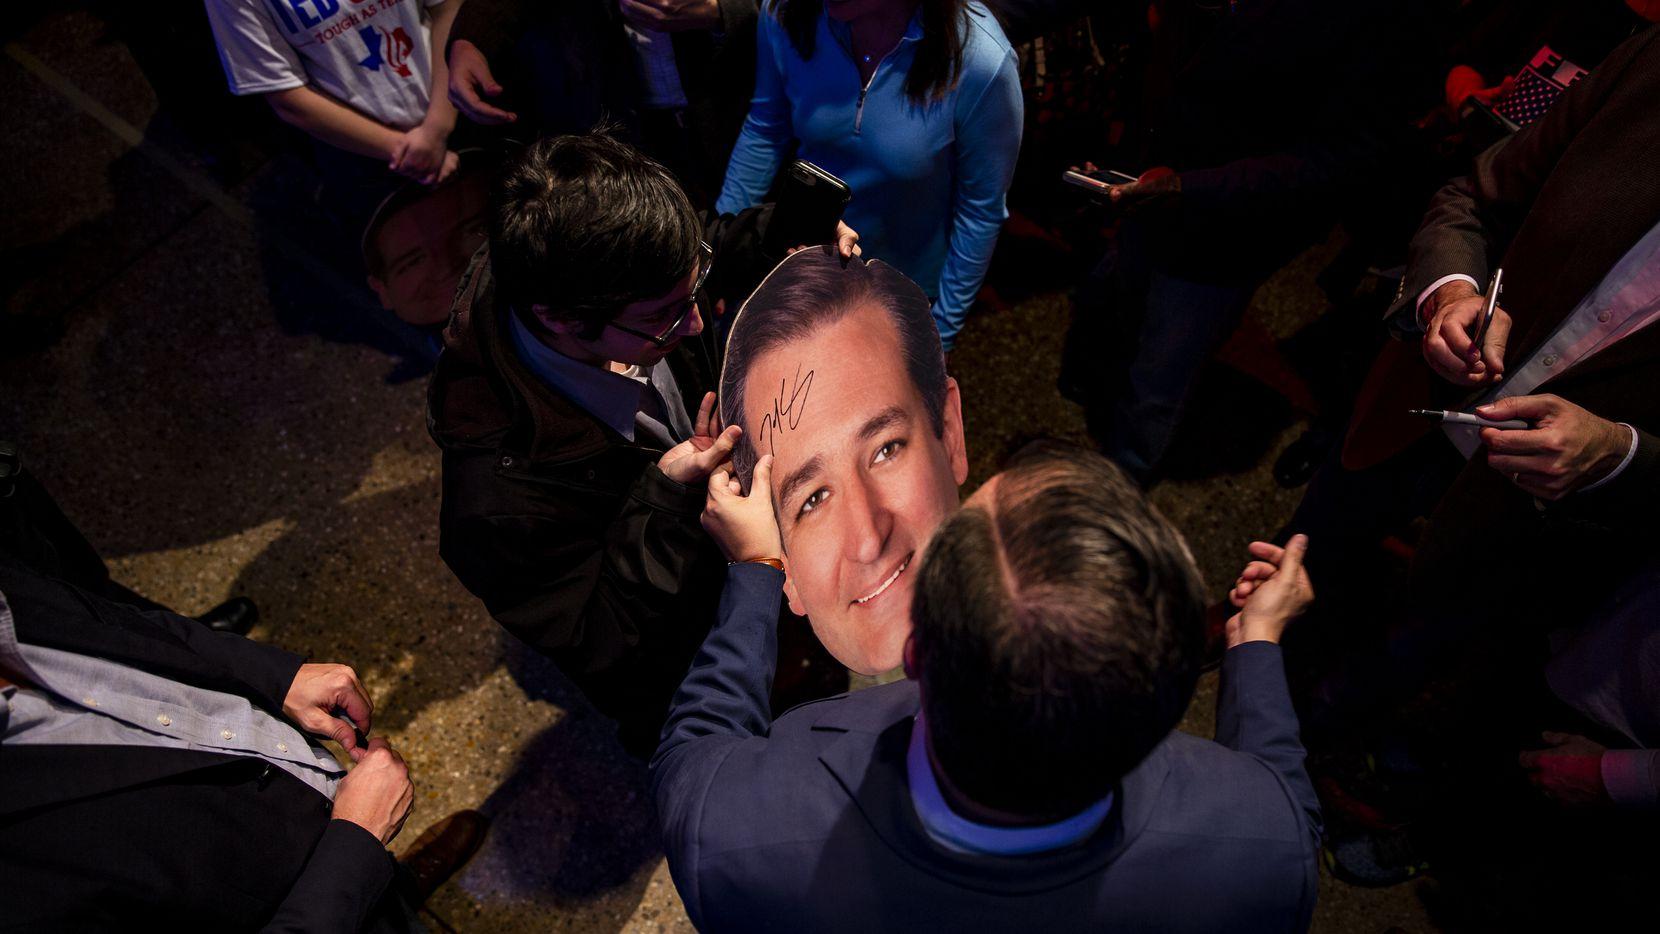 Senator Ted Cruz signs a cutout of his head following a campaign rally at Cendera Center in Ft. Worth on Friday, November 2, 2018. (Shaban Athuman/The Dallas Morning News)